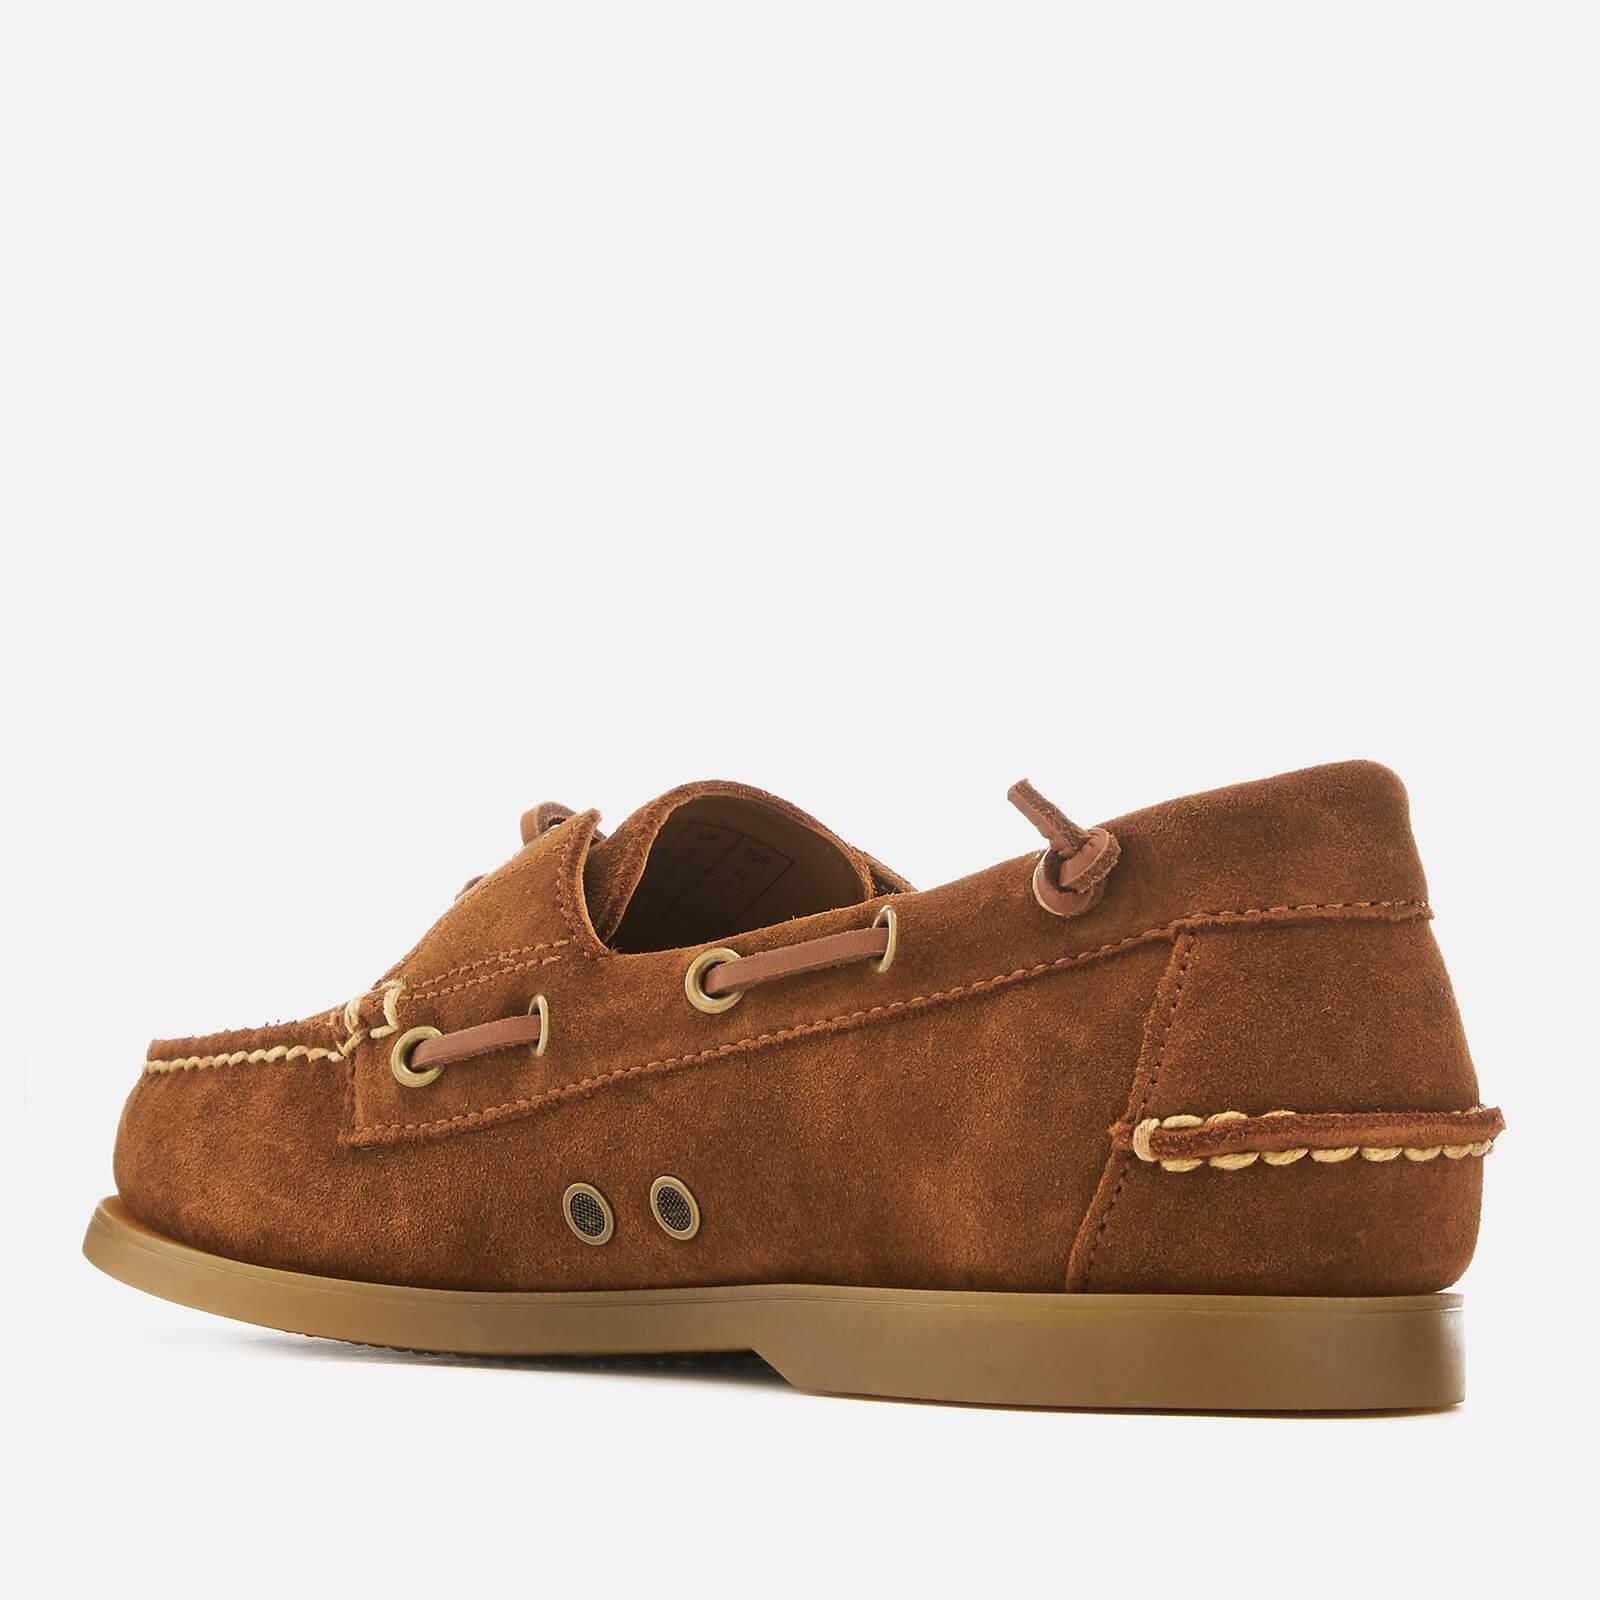 Merton Suede Boat Shoes in Tan (Brown